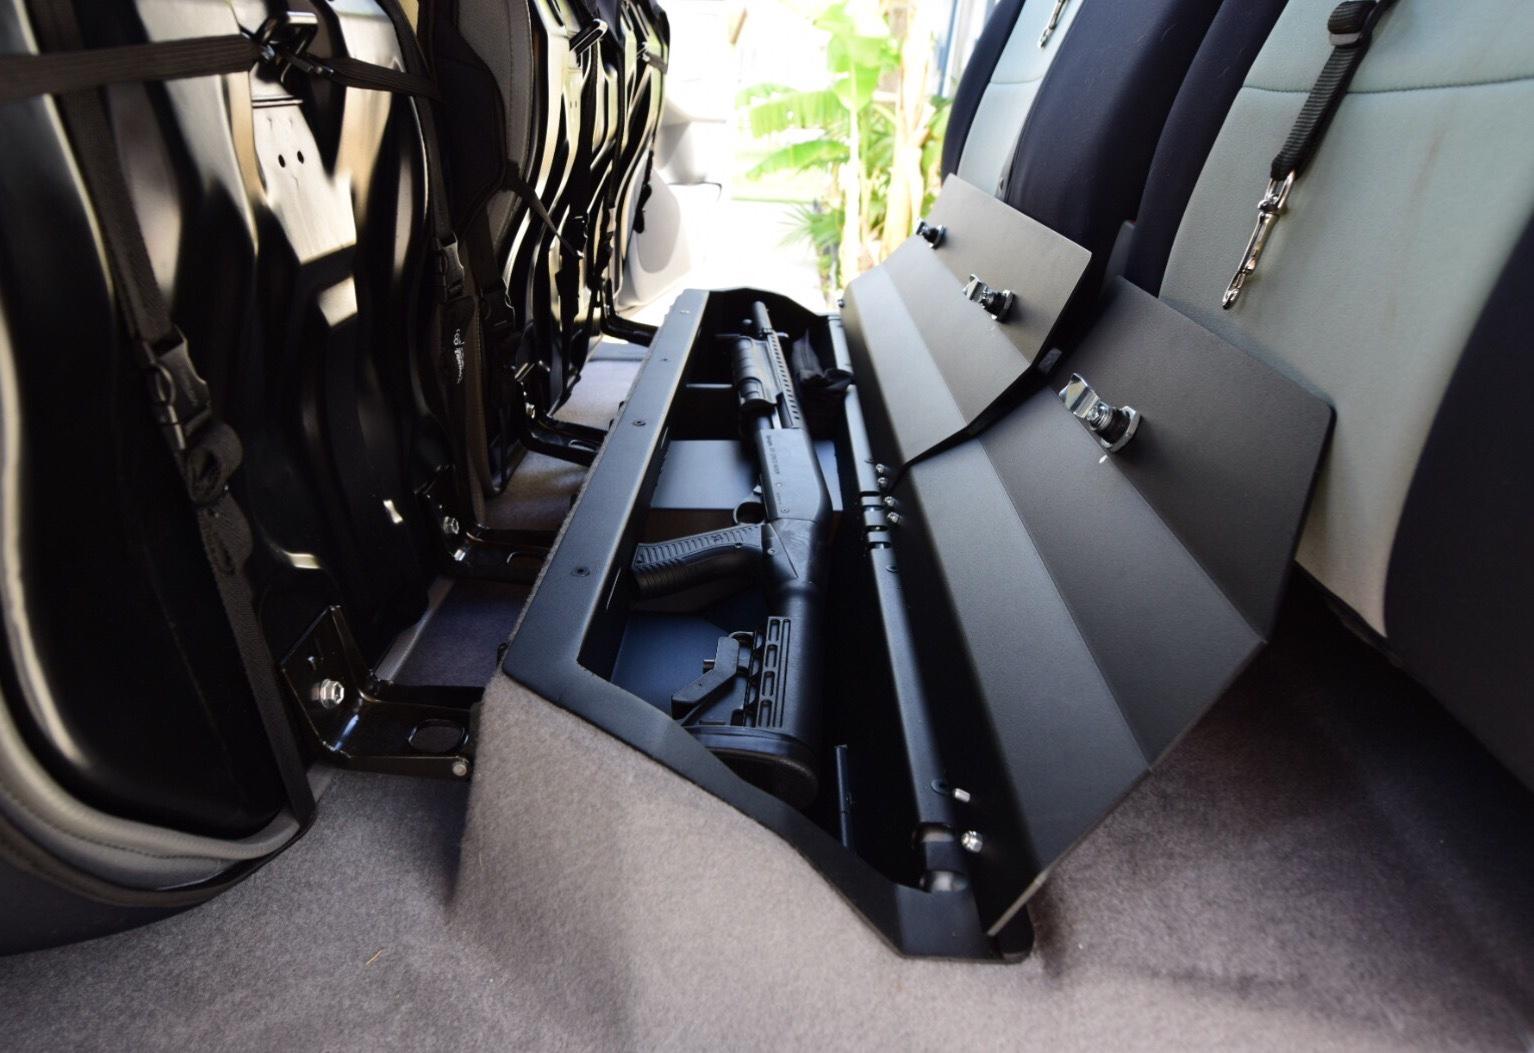 tacoma storage truck accessories seat toyota under rear esp interior cab lockable rifle road double unit forum trucks lifted ttora